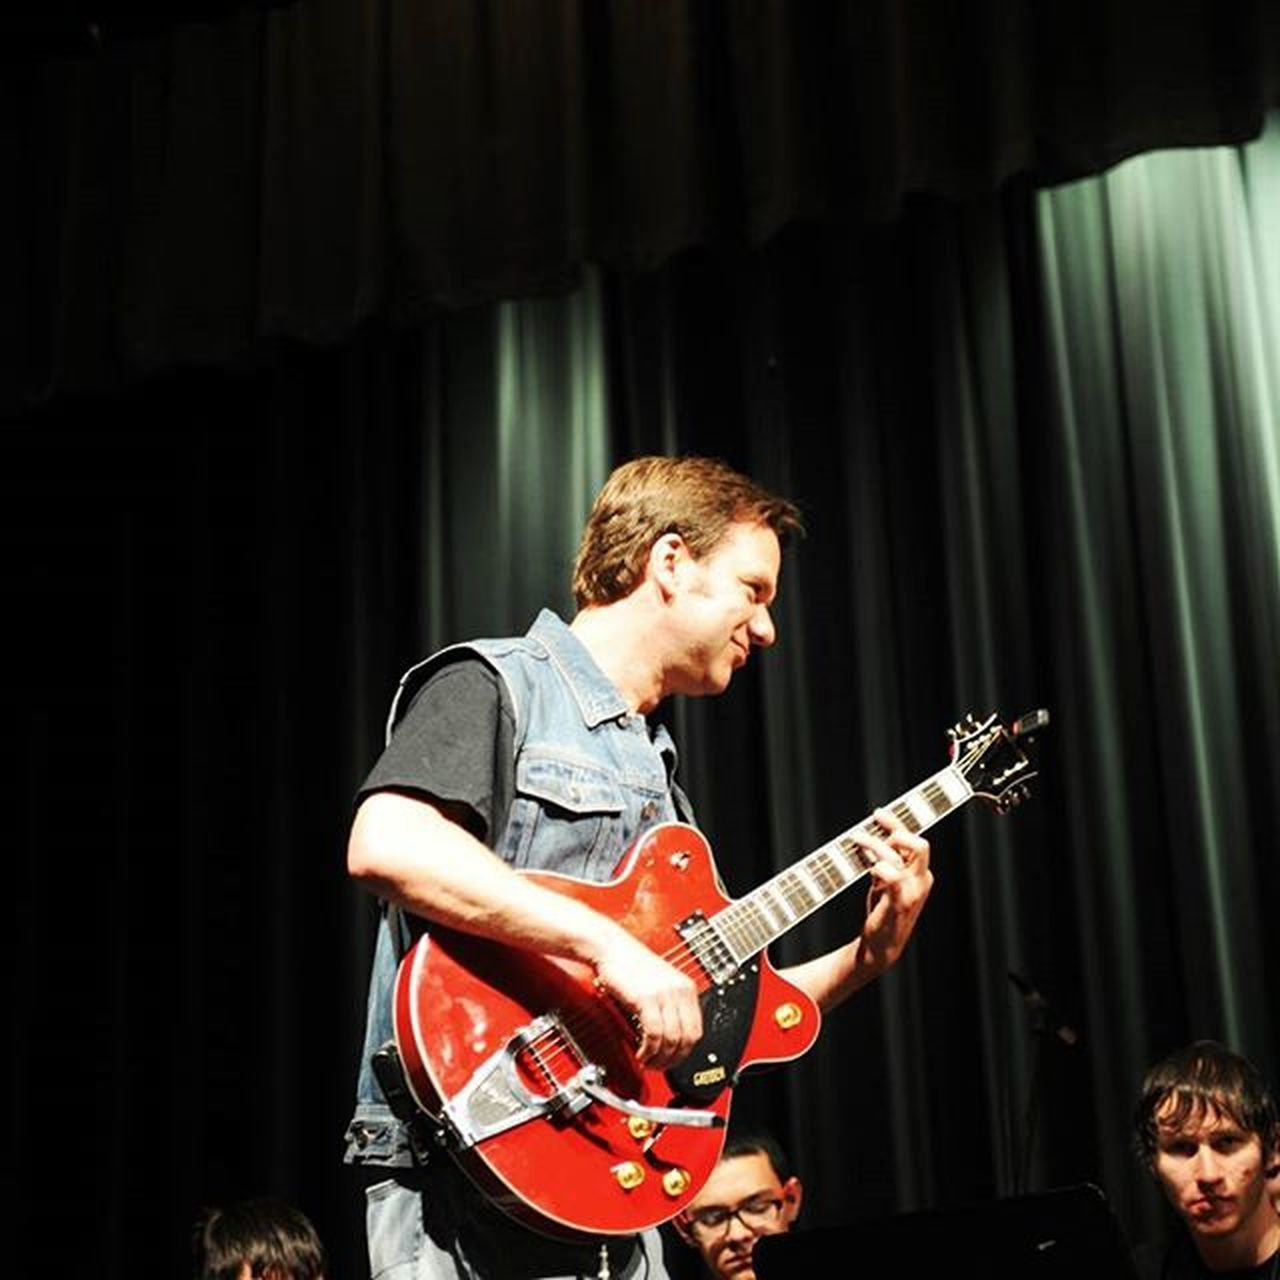 Manzano High School 2016 Spring Rock Concert. Blackandwhite Concert Photography